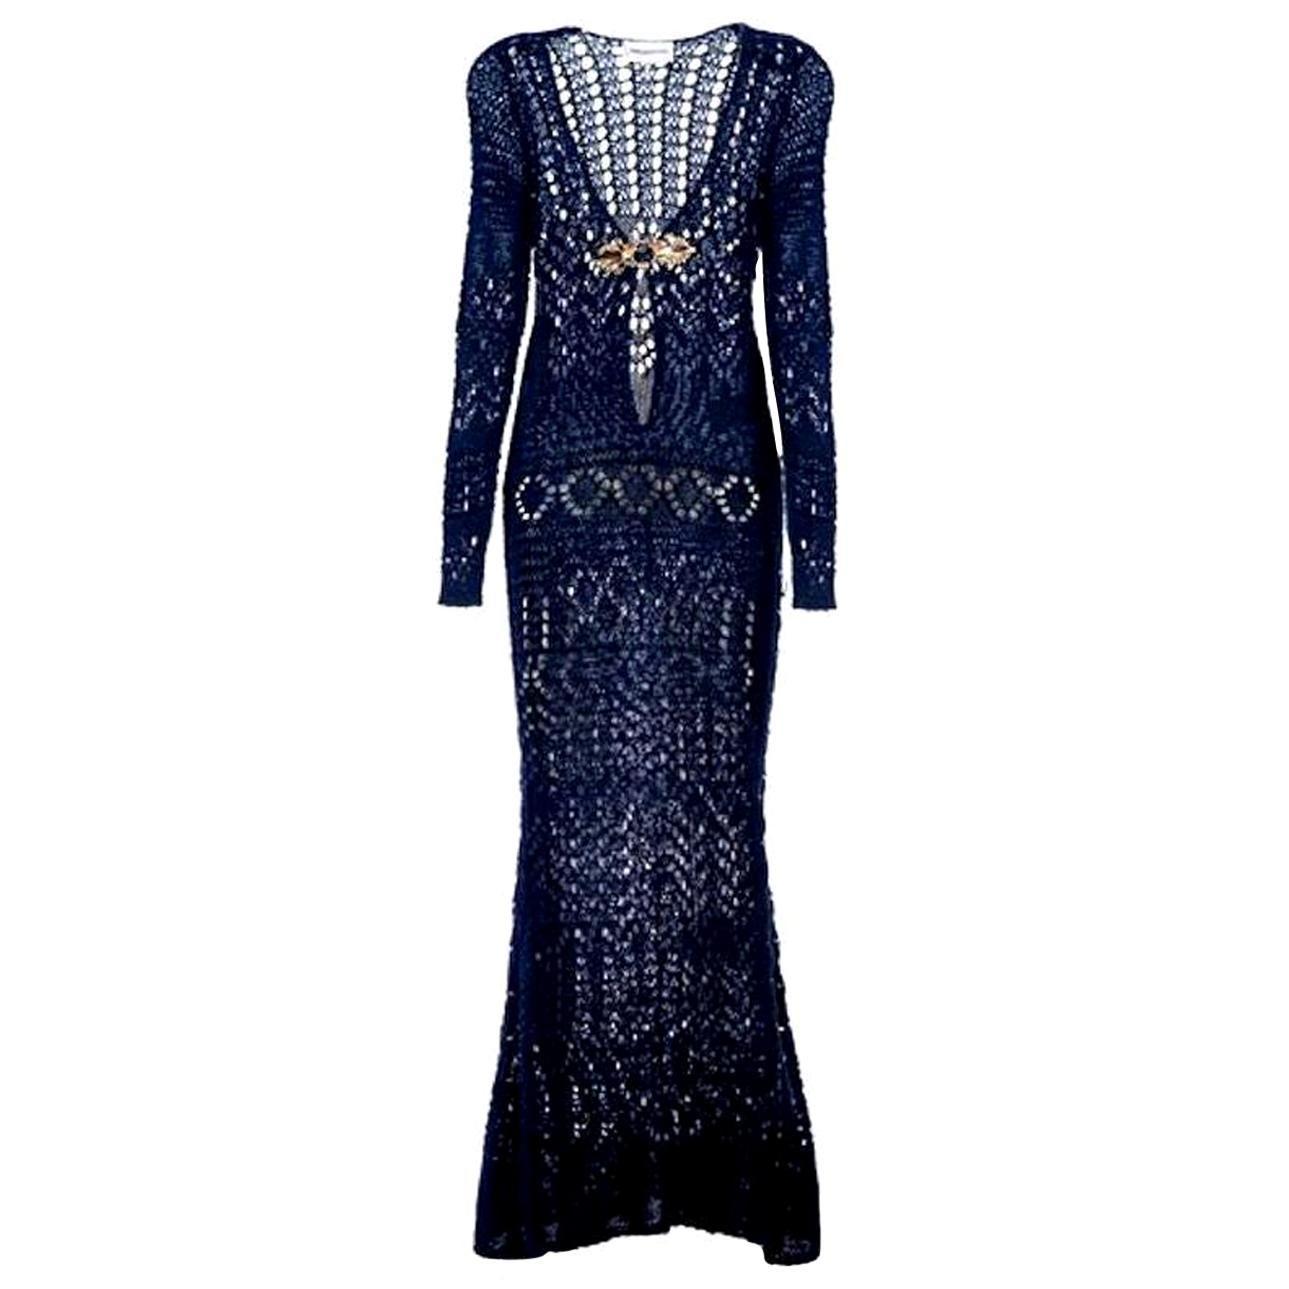 NEW Breathtaking Emilio Pucci Crochet Knit Evening Gown Maxi Dress